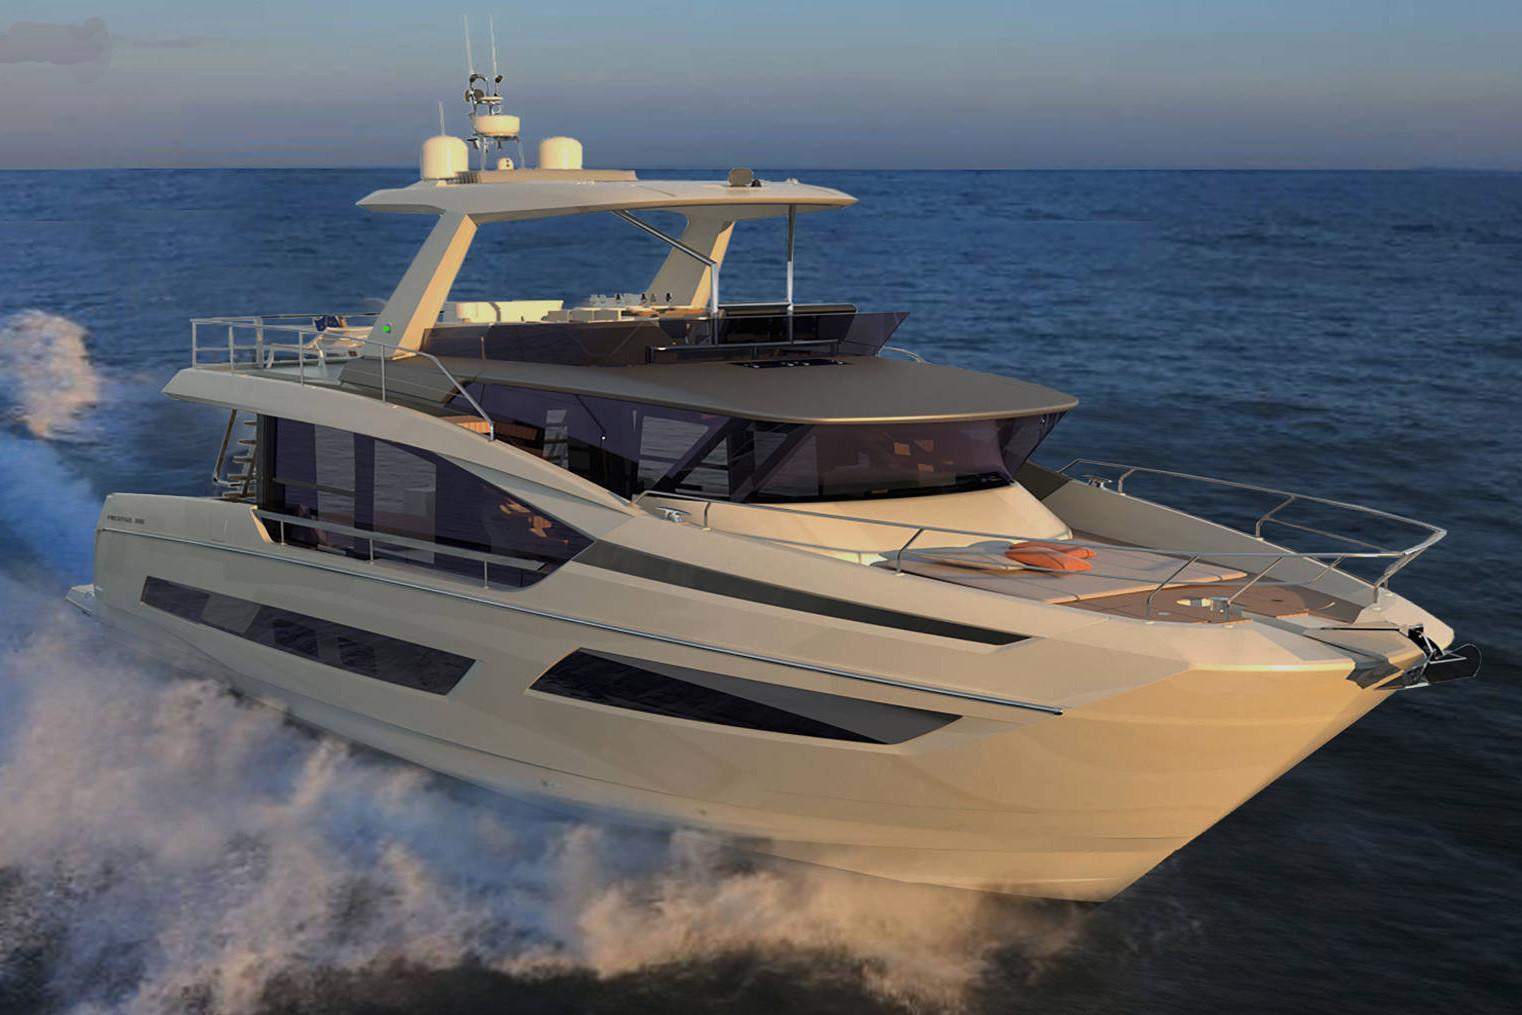 2022 Prestige X70 #75880 inventory image at Sun Country Coastal in Newport Beach